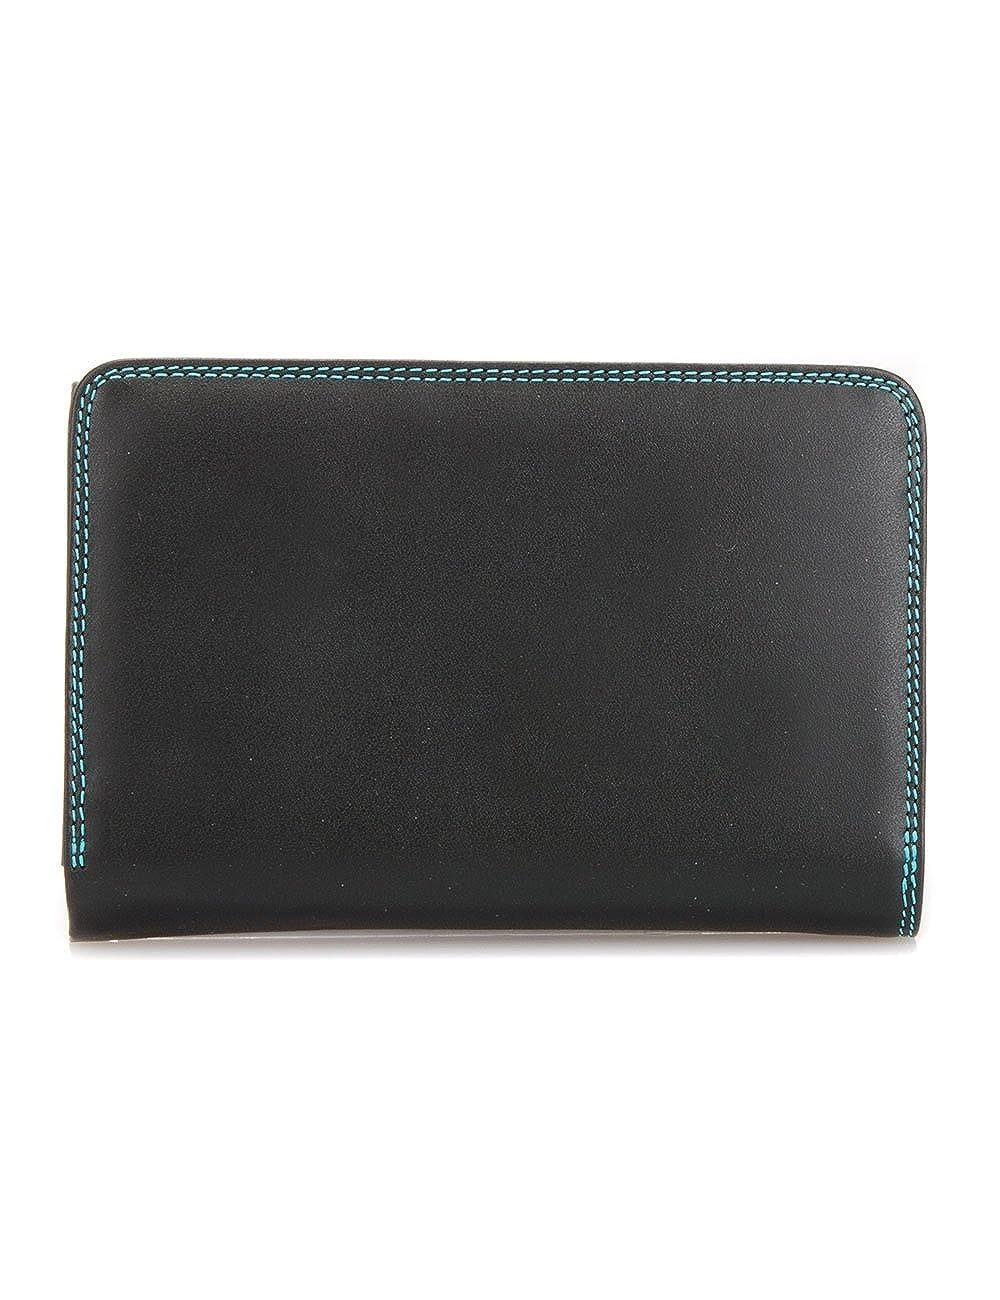 mywalit Medium Tri-fold Monedero piel 14 cm black/pace ...